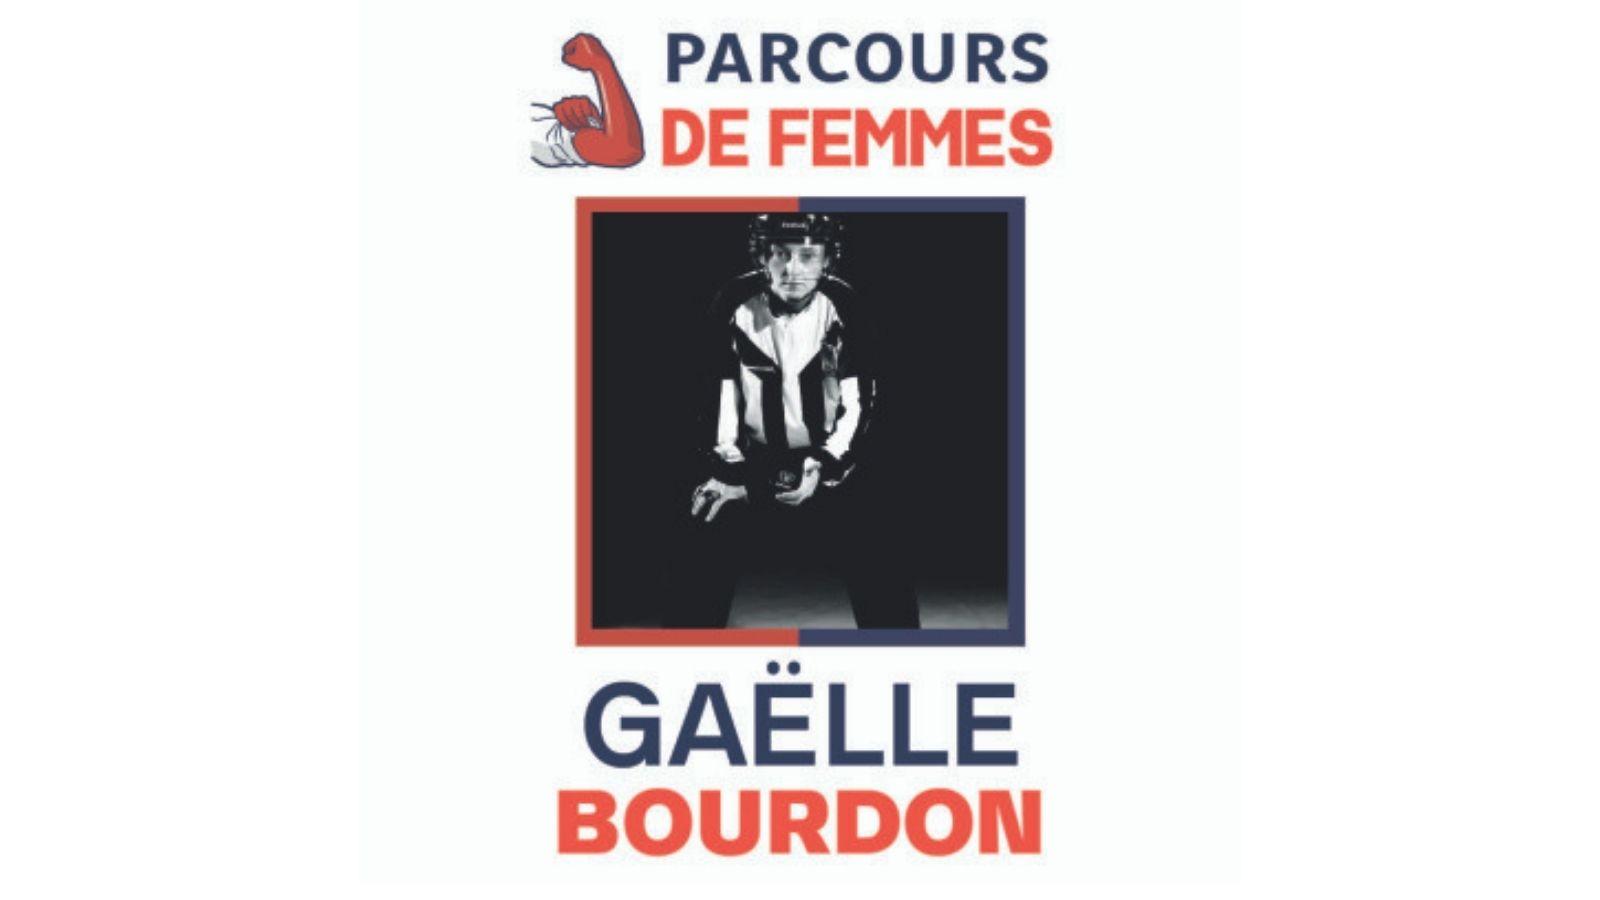 Gaëlle Bourdon